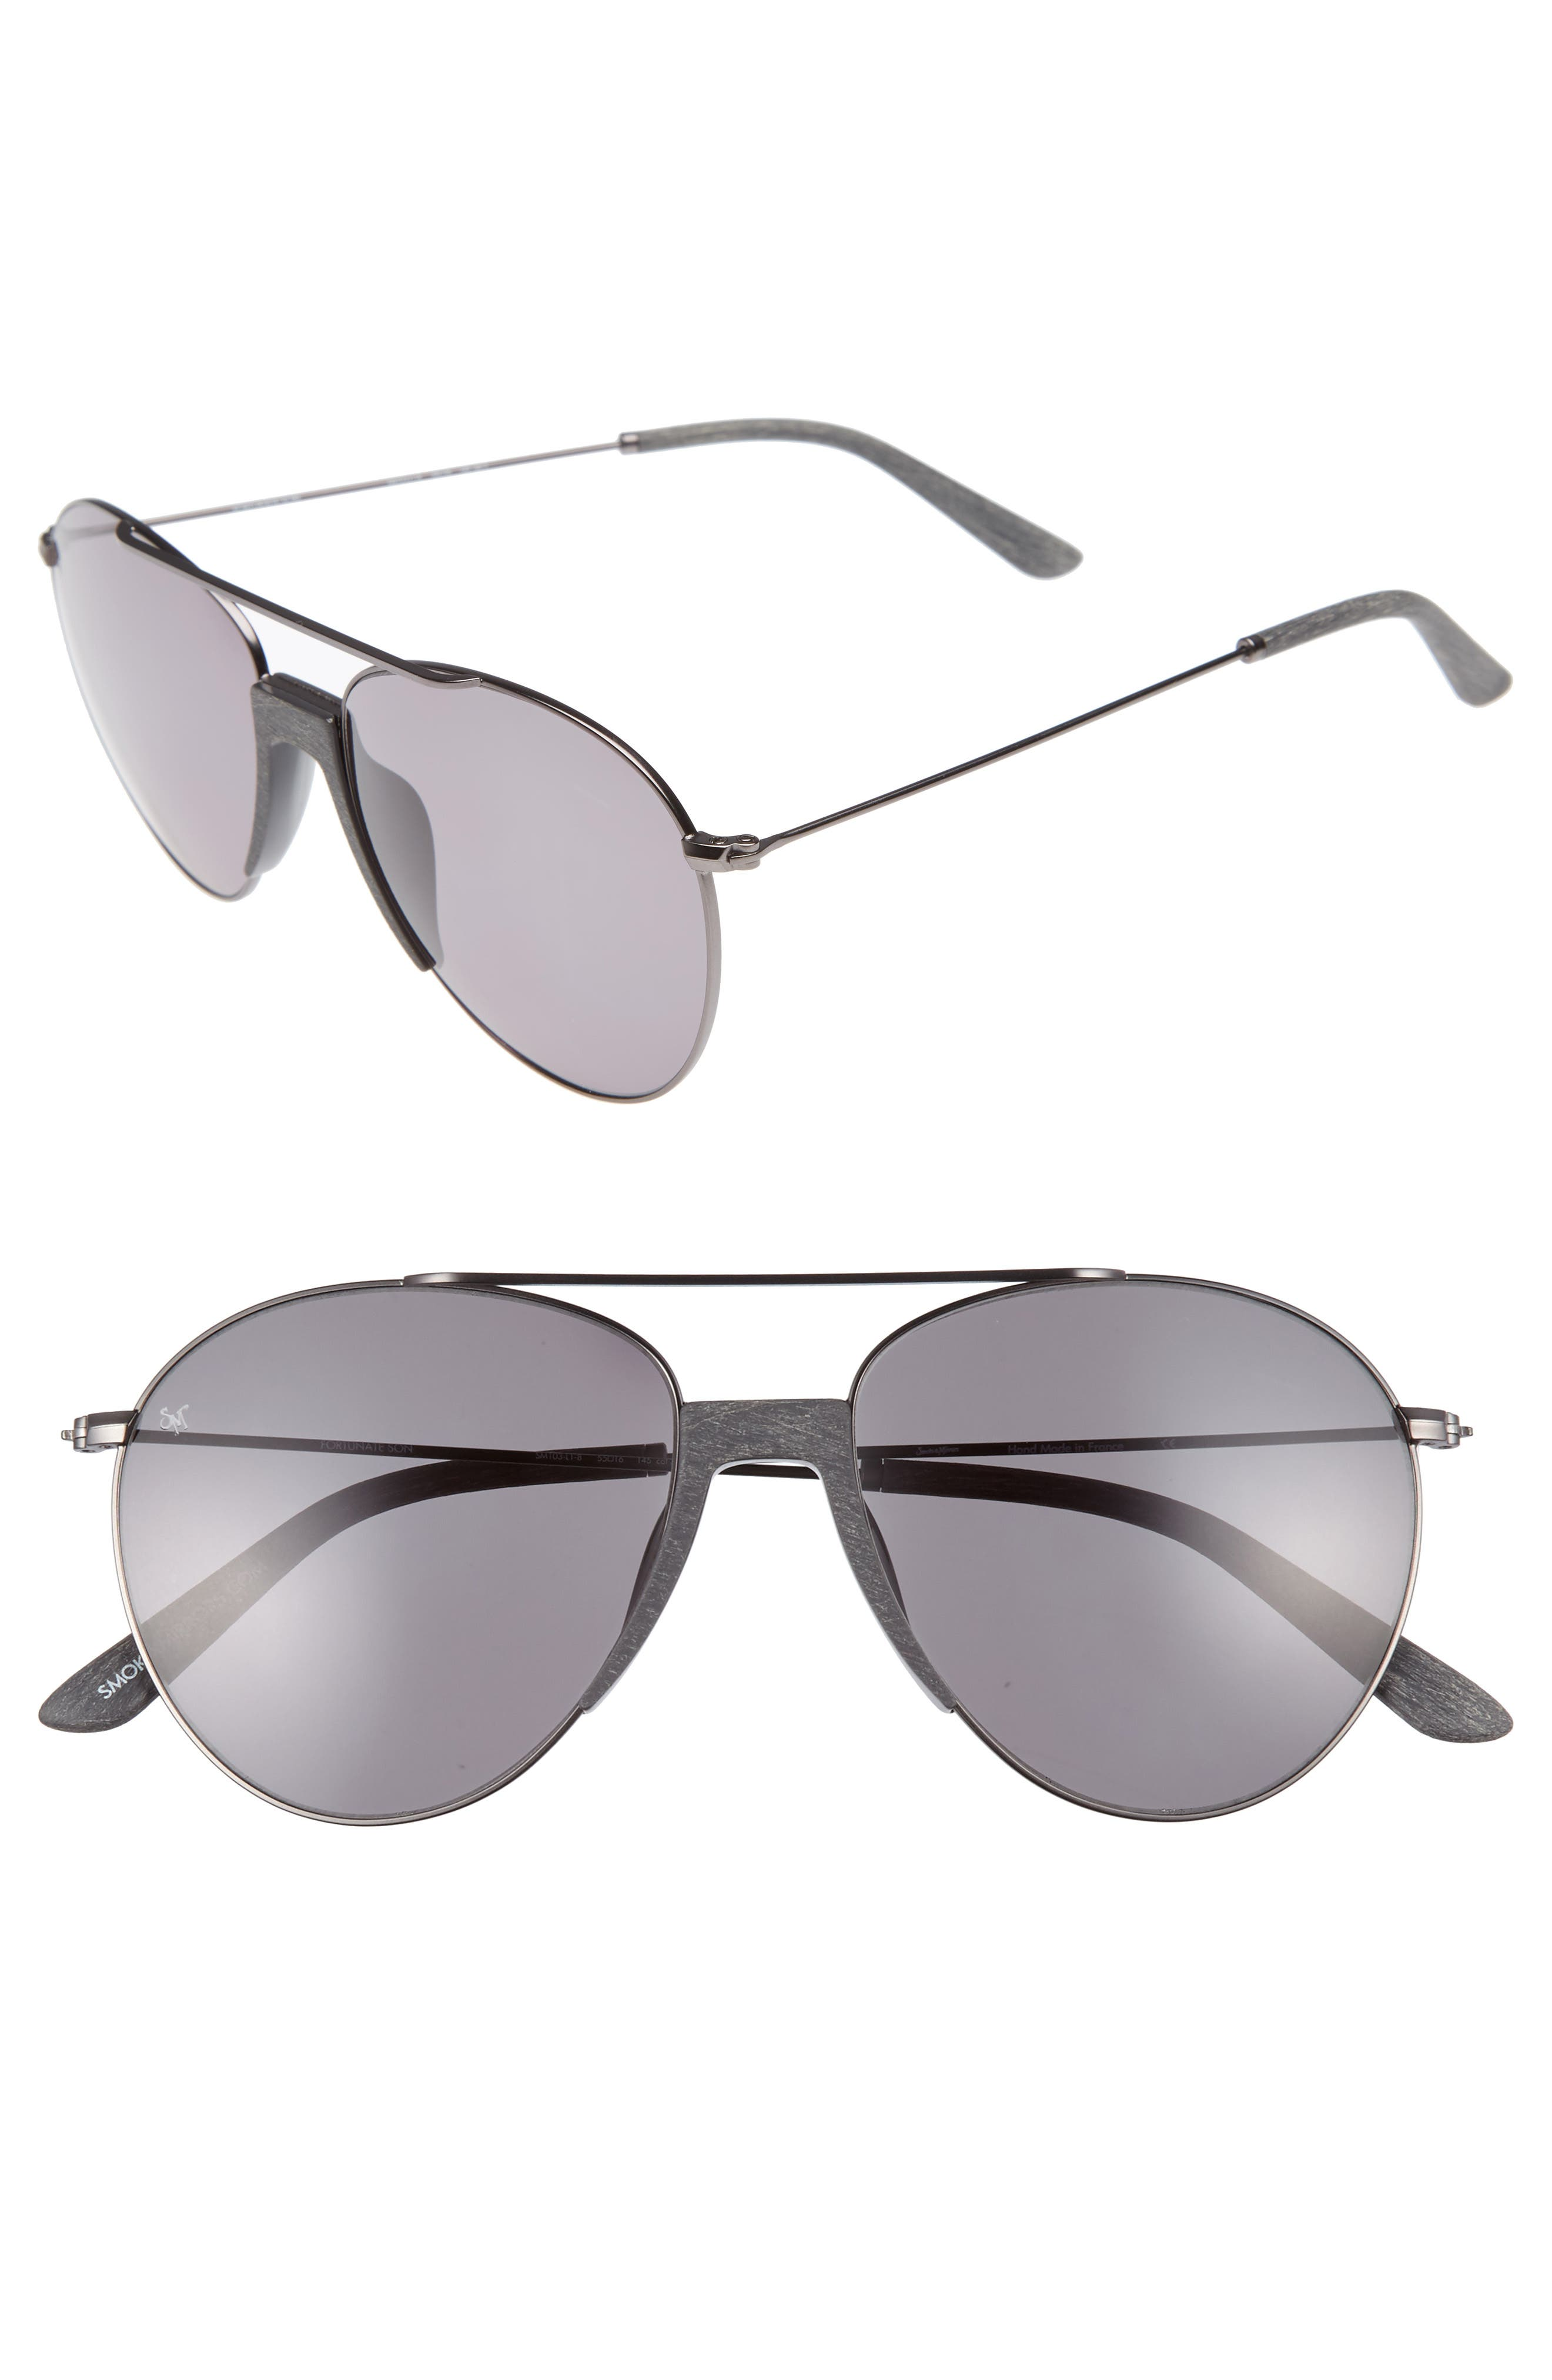 Fortunate Son 55mm Gradient Lens Aviator Sunglasses,                             Main thumbnail 1, color,                             Grey Wood/ Light Green